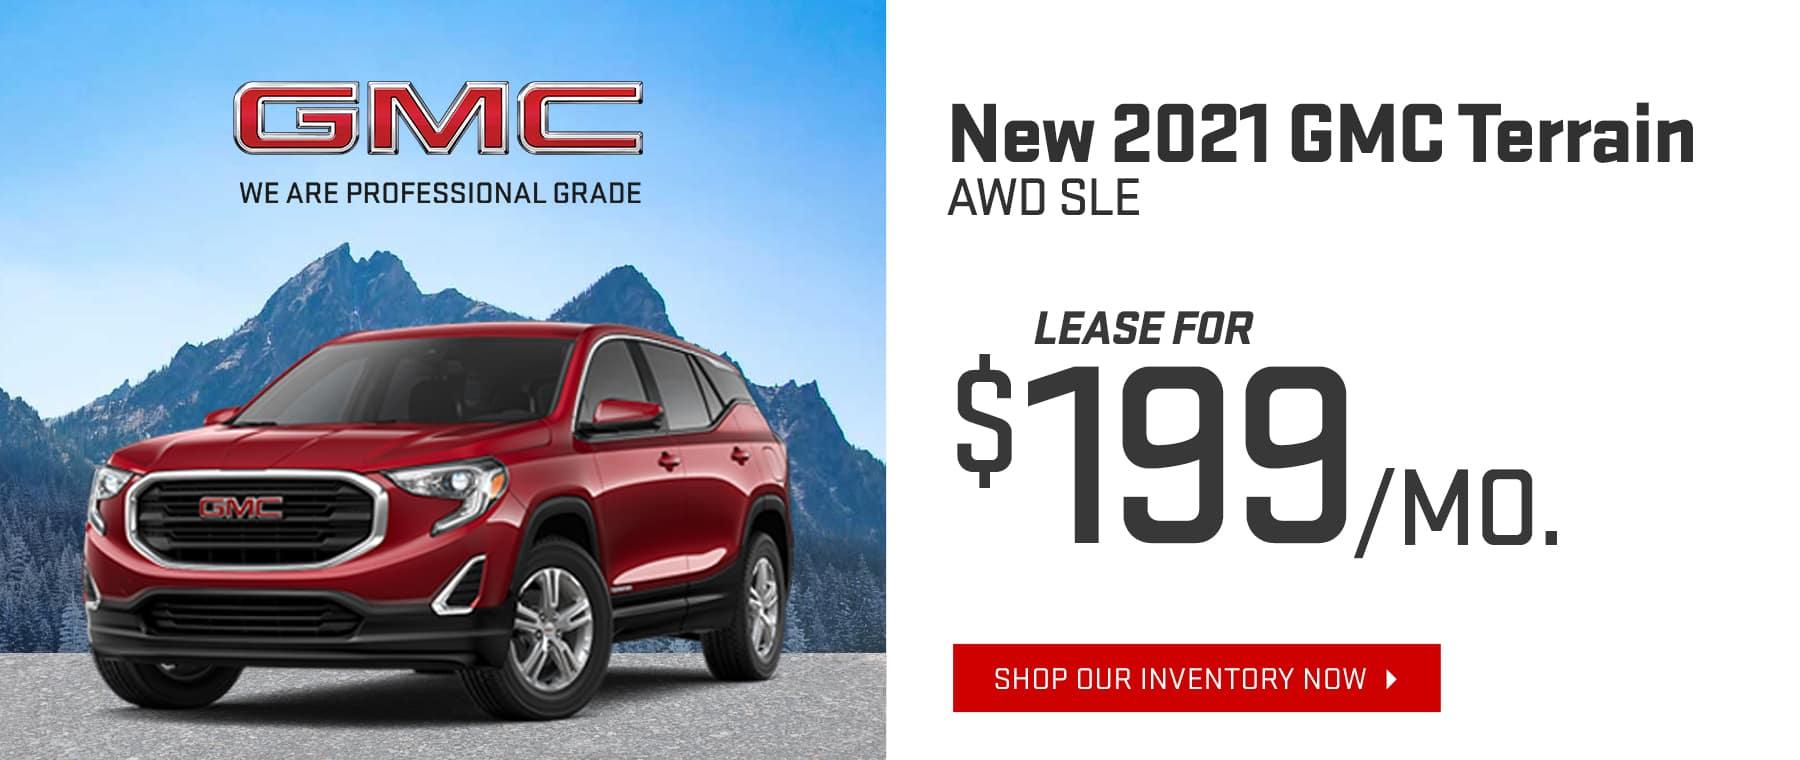 HURD_1800x760_New 2020 GMC Terrain AWD SLE-0121